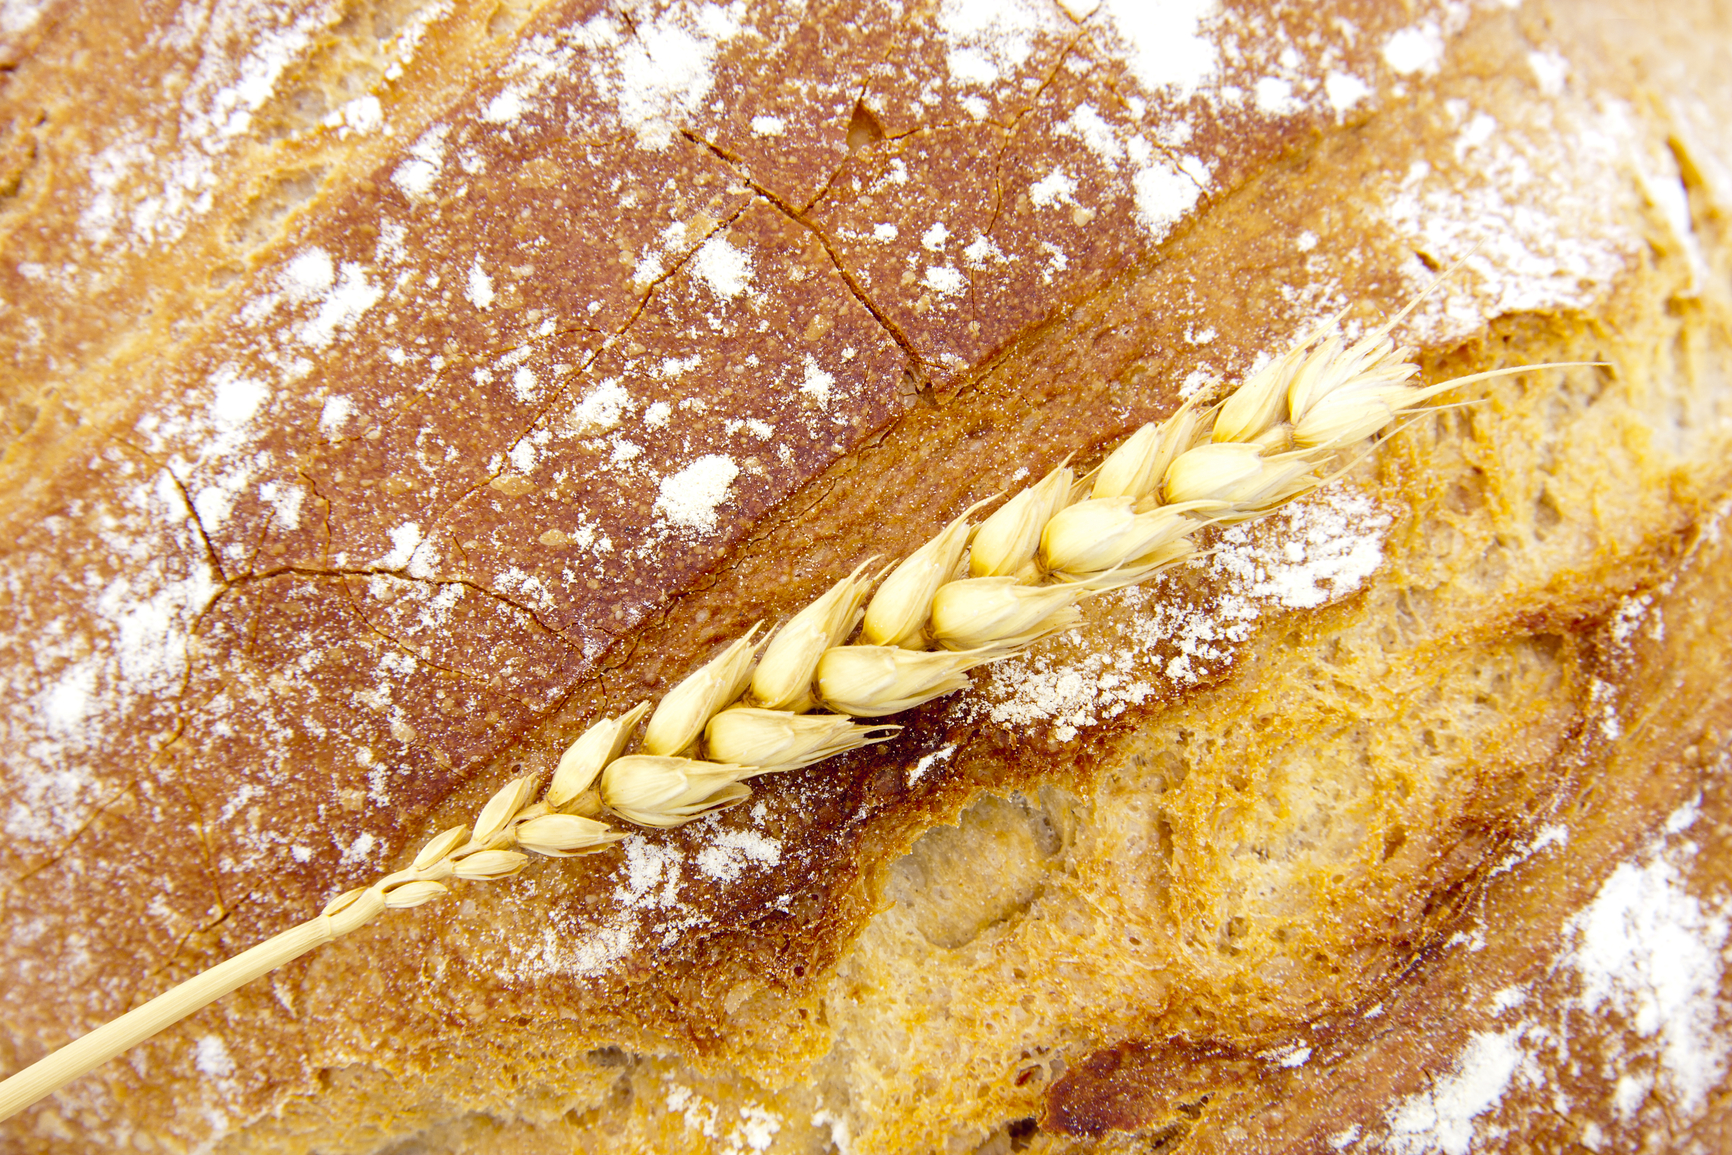 фото для быстрый хлеб хлебопечки